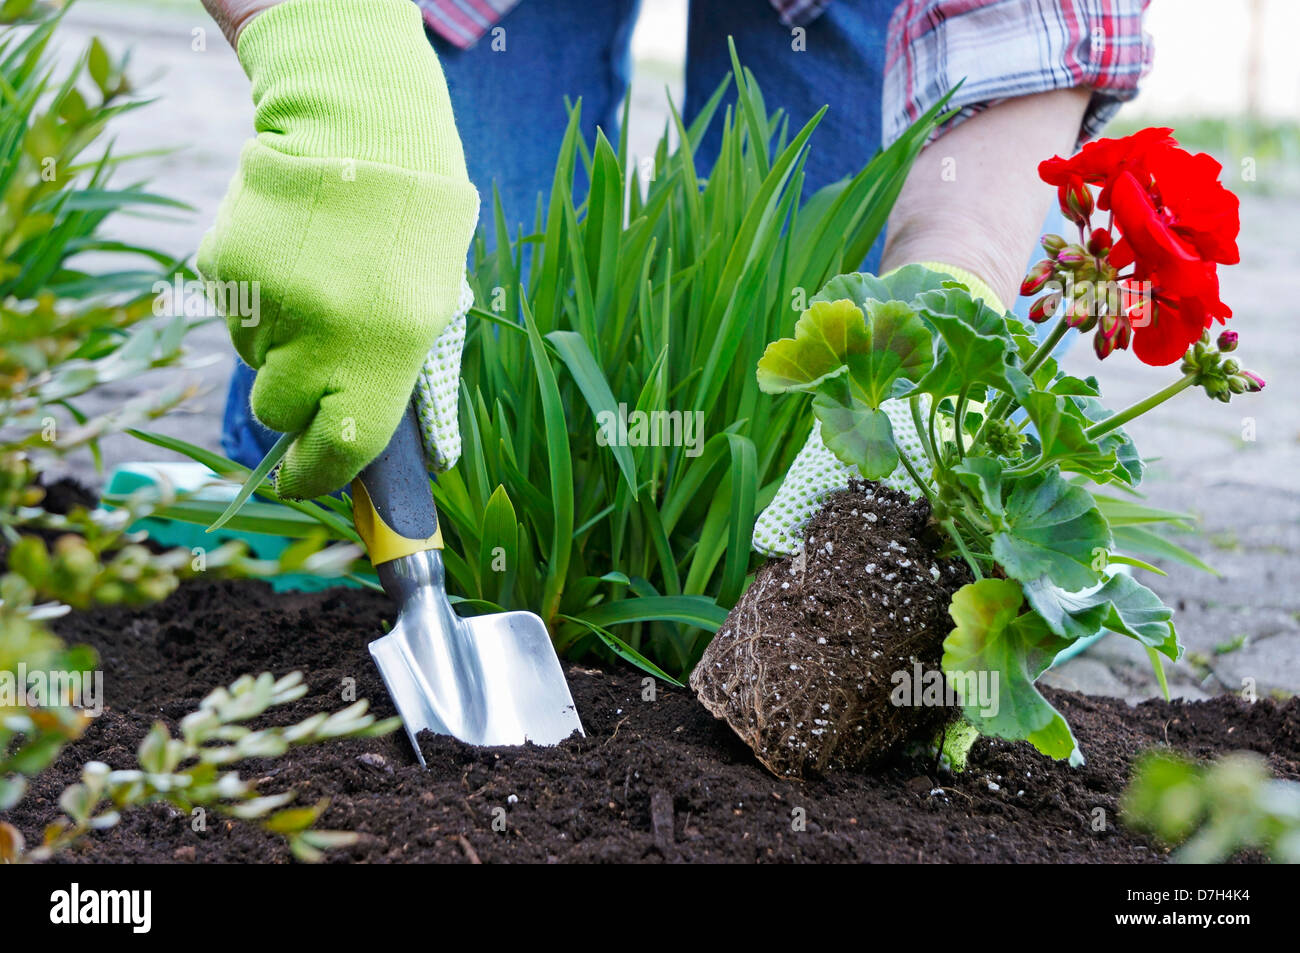 Gardening, Planting Flowers, Geranium - Stock Image